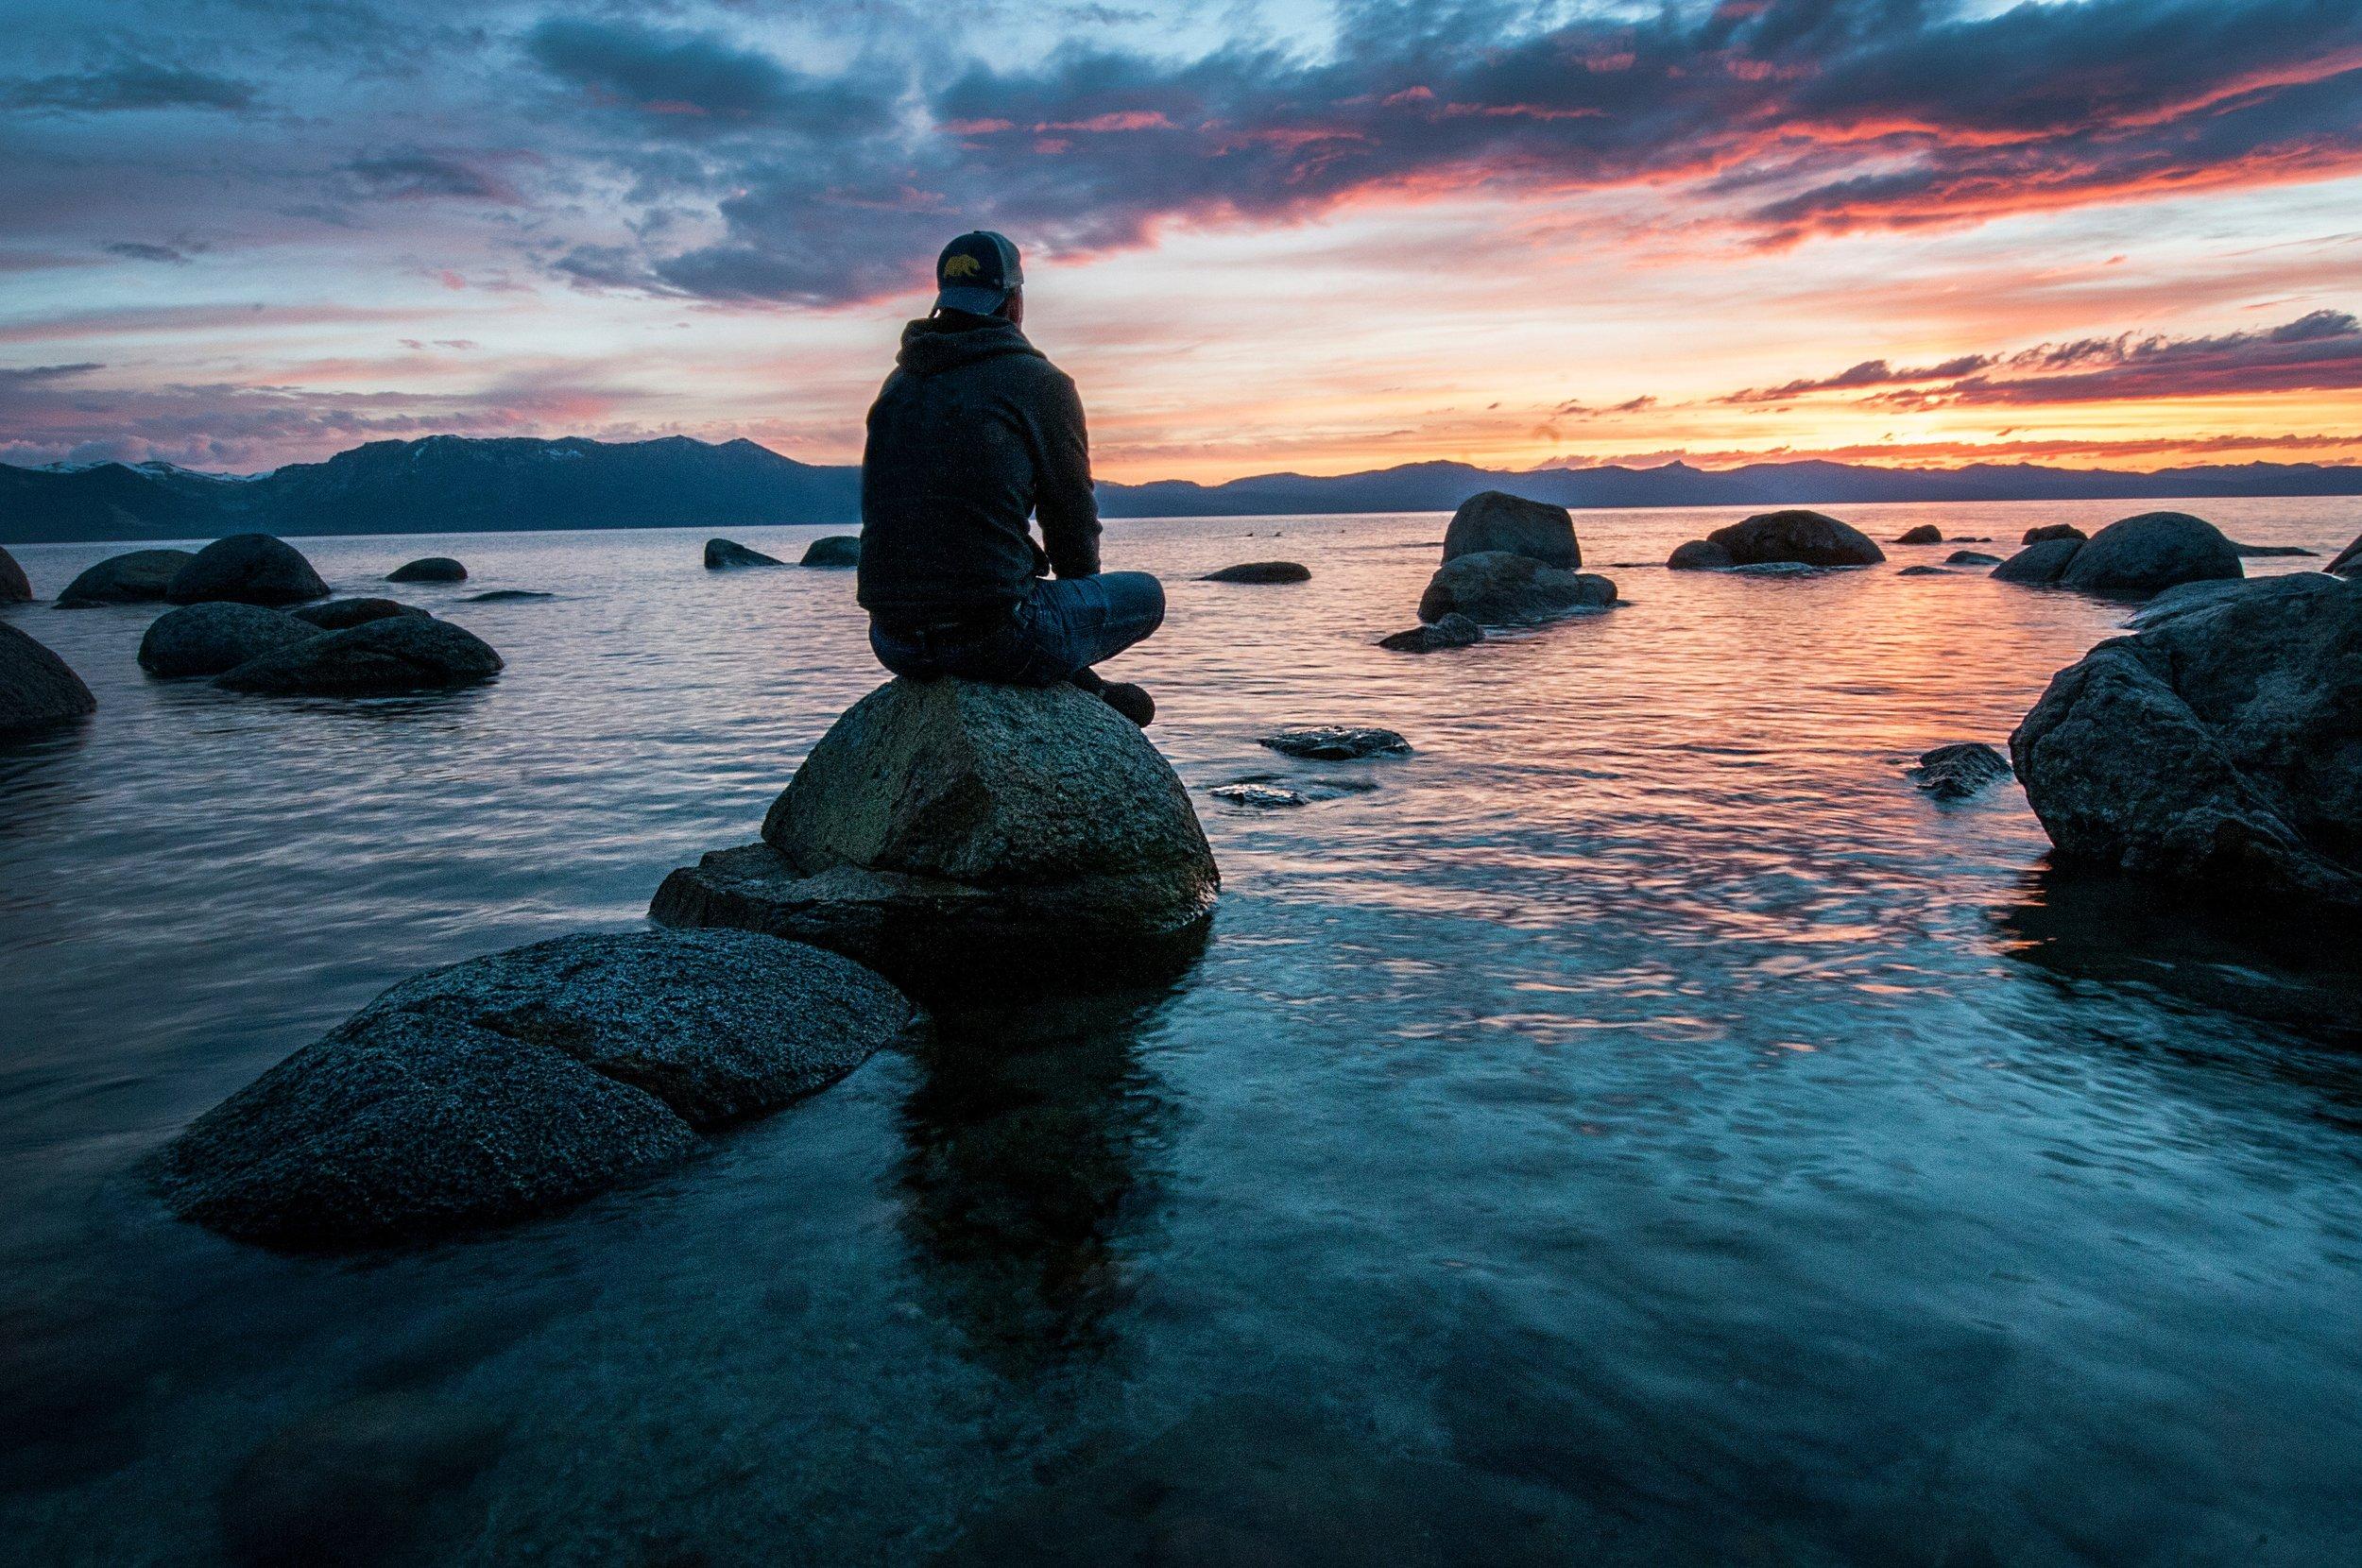 Photo by  Keegan Houser  on  Unsplash